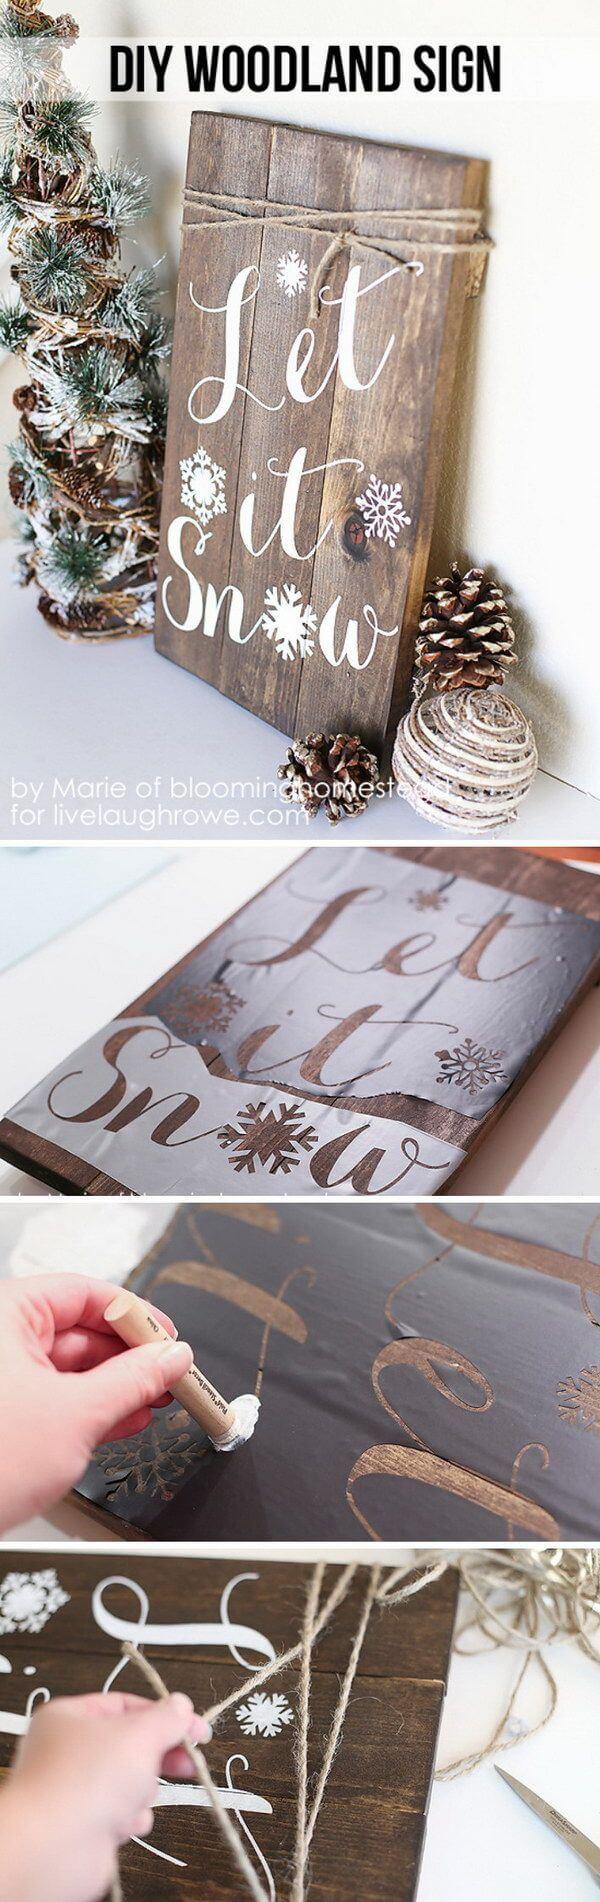 Wood Signs Ideas - Simple Stenciled Holiday Panel - harpmagazine.com